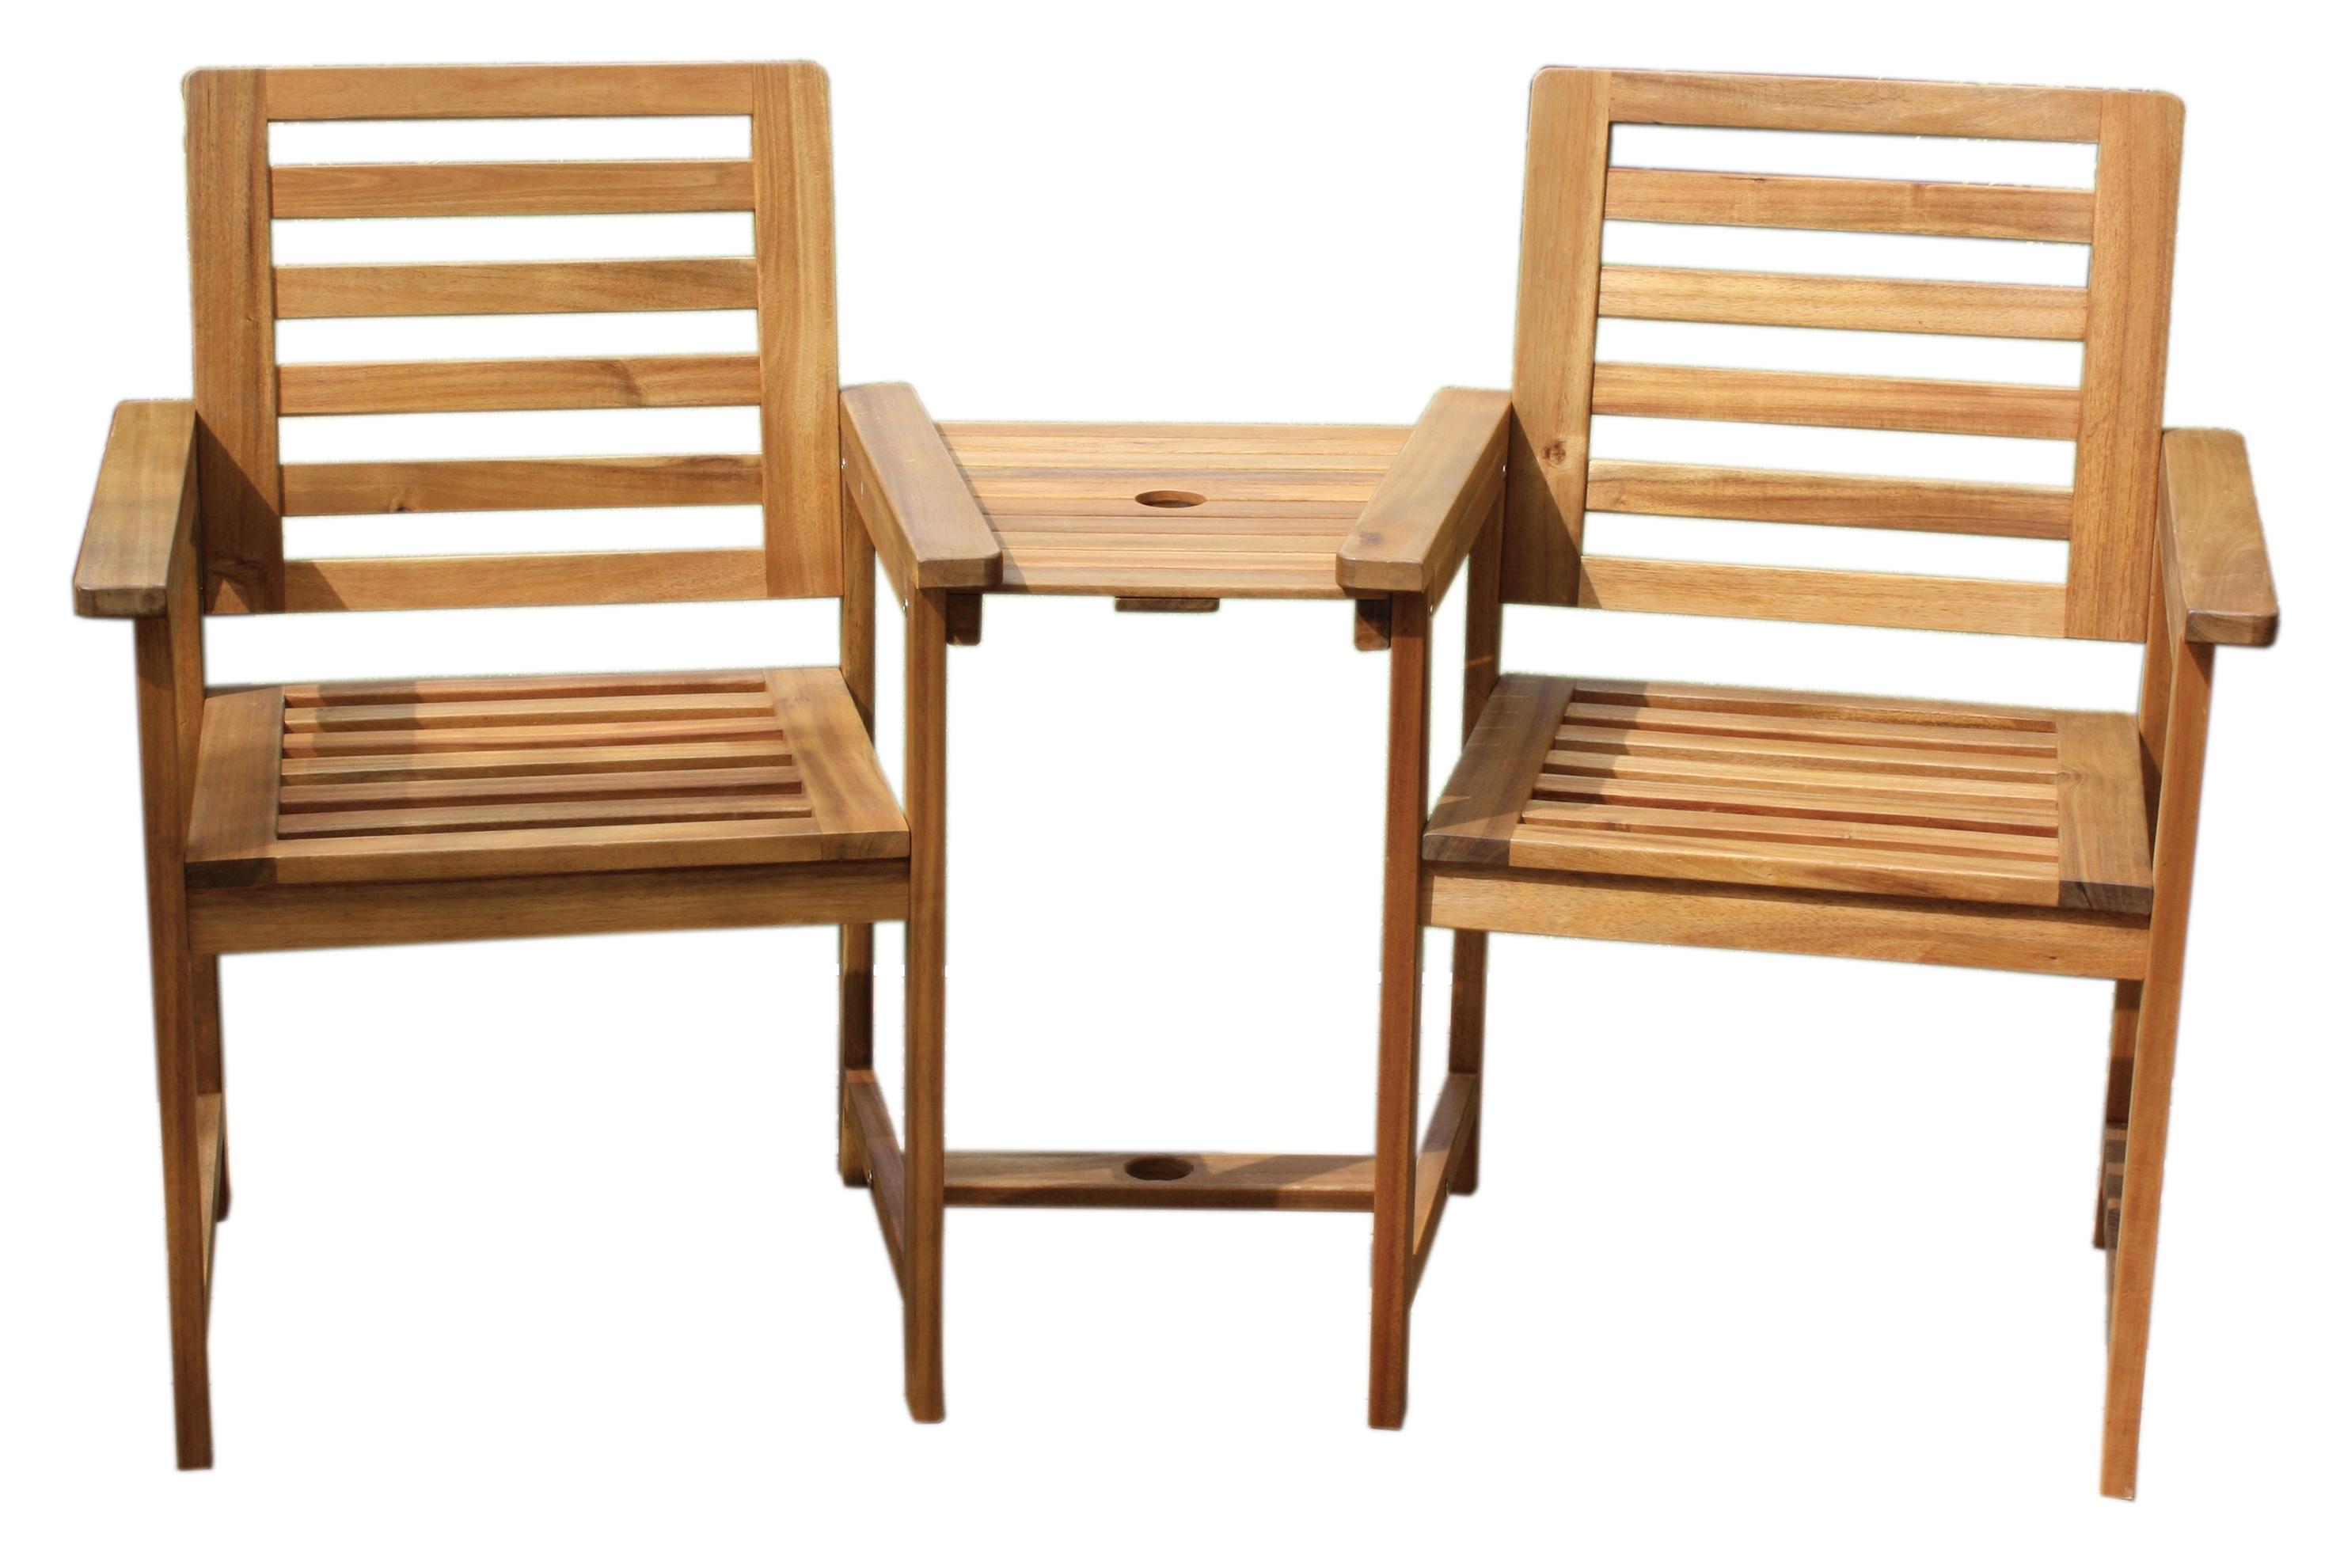 gartenbank tisch holzbank gartenstuhl lovechair sitzbank holz 2 sitzer companion ebay. Black Bedroom Furniture Sets. Home Design Ideas